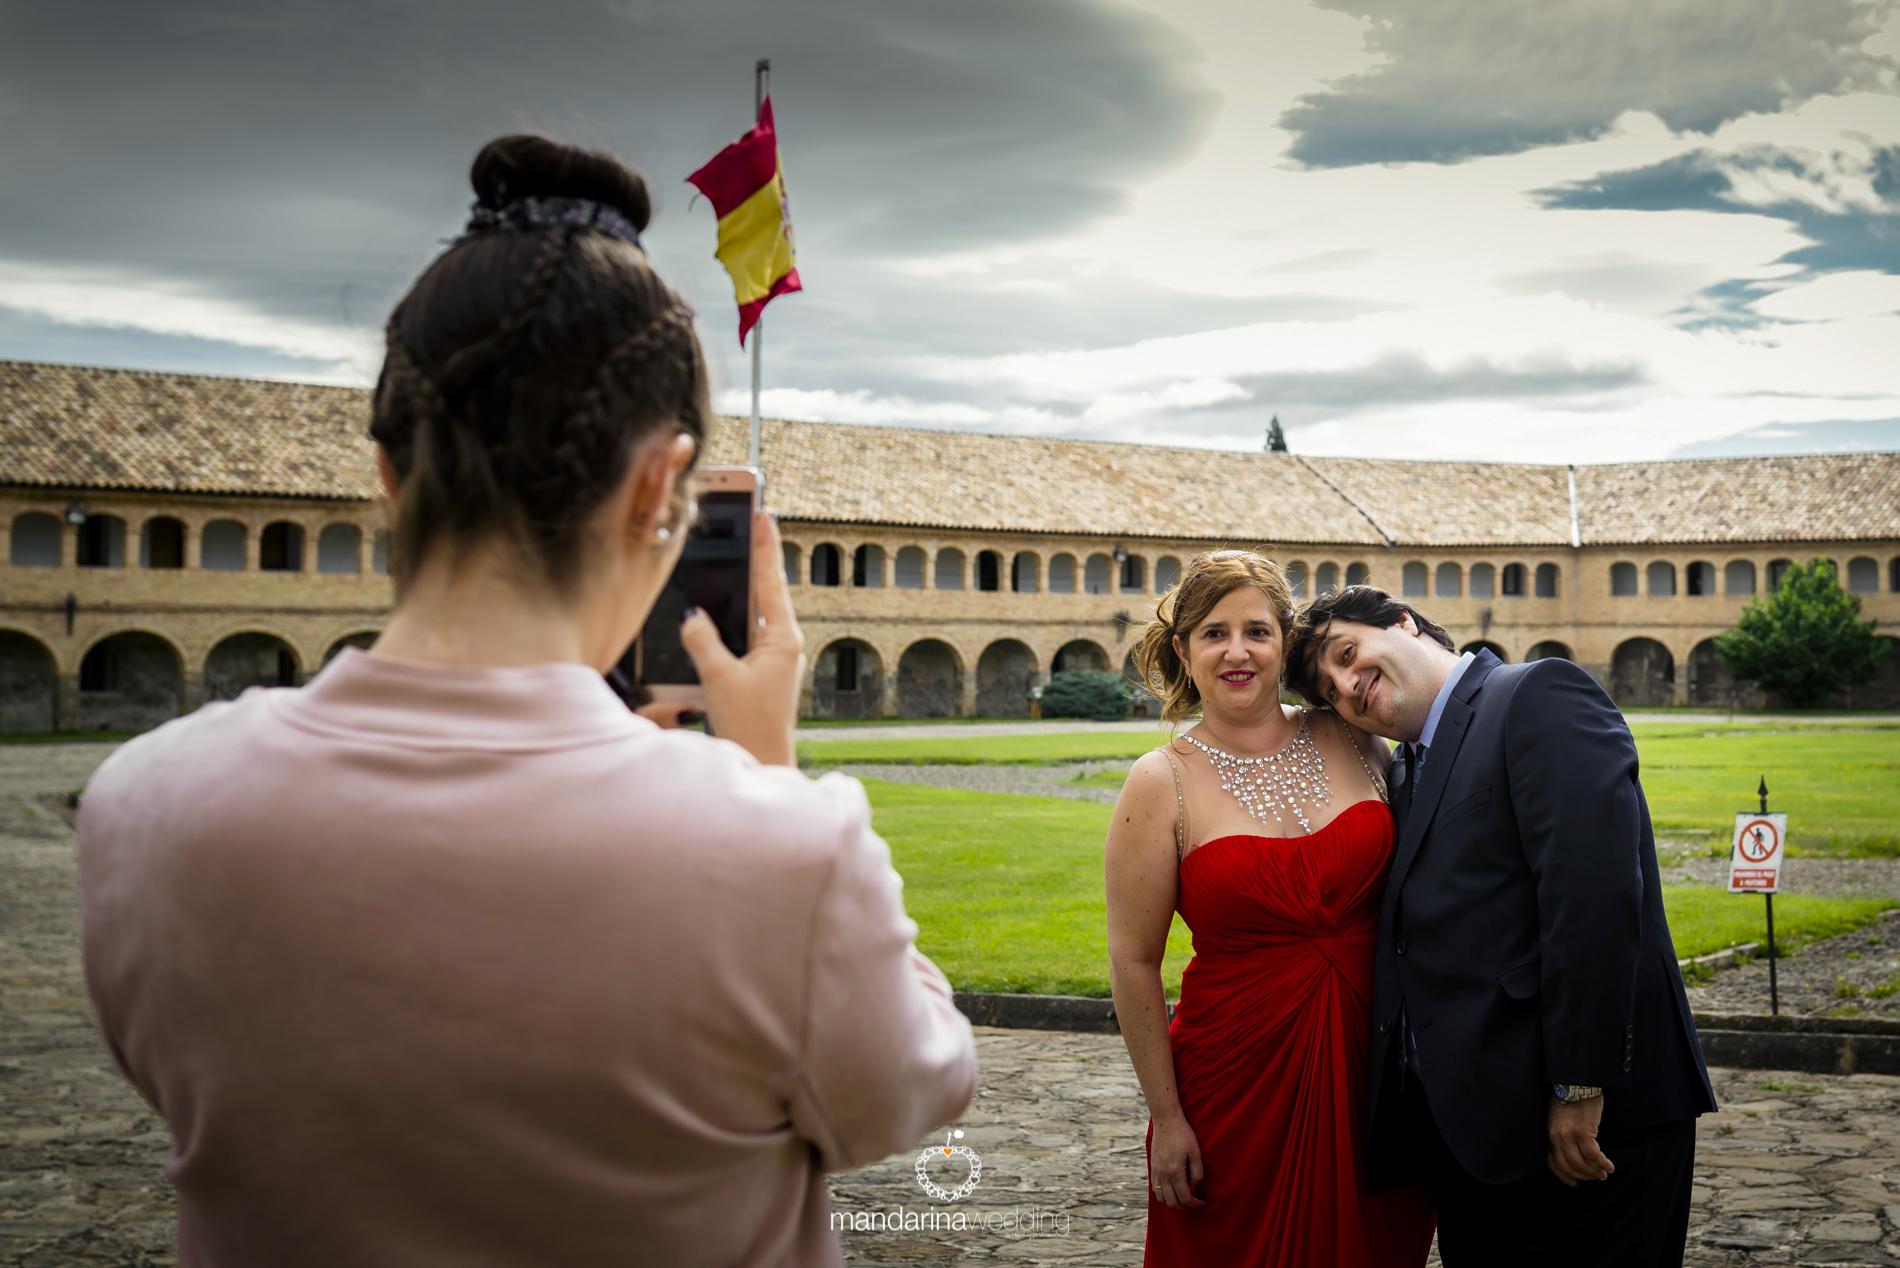 mandaria wedding, fotografos de boda, fotoperiodismo de boda, mejores fotografos de boda, bodas soria, bodas pirineo, bodas Madrid, fotógrafos tarragona_08